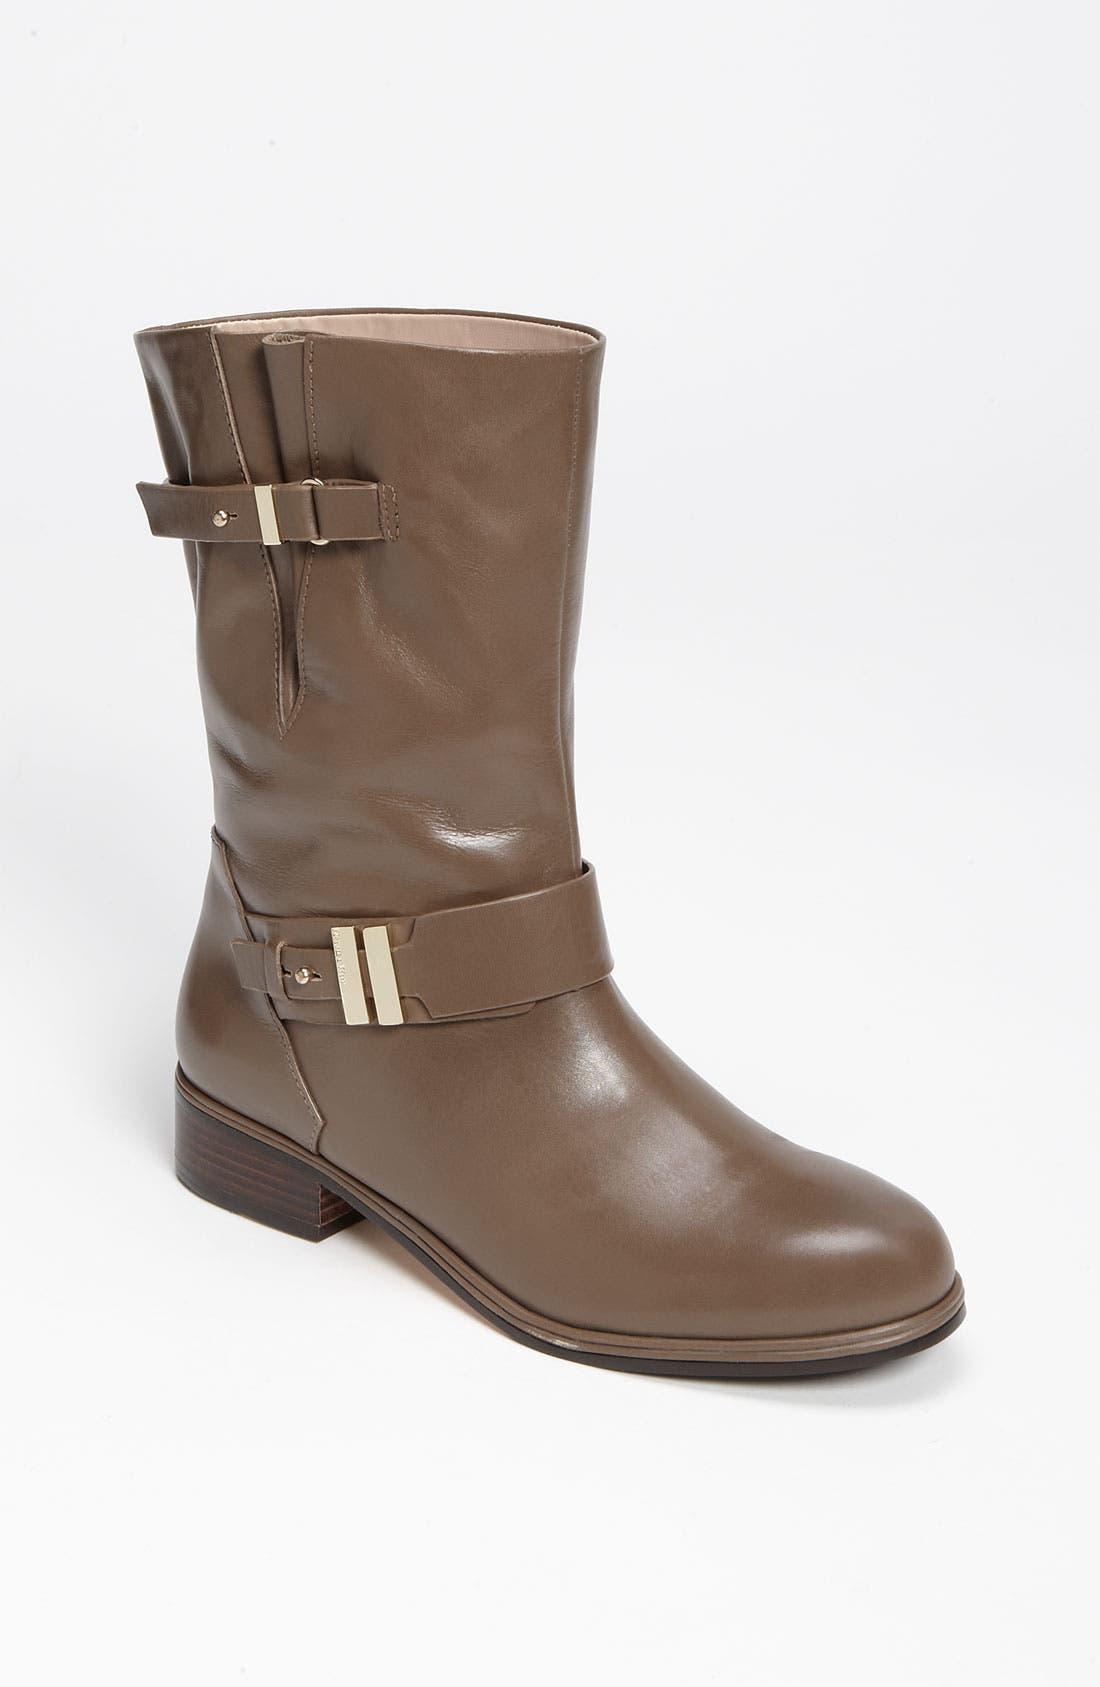 Alternate Image 1 Selected - Rachel Roy 'Corine' Boot